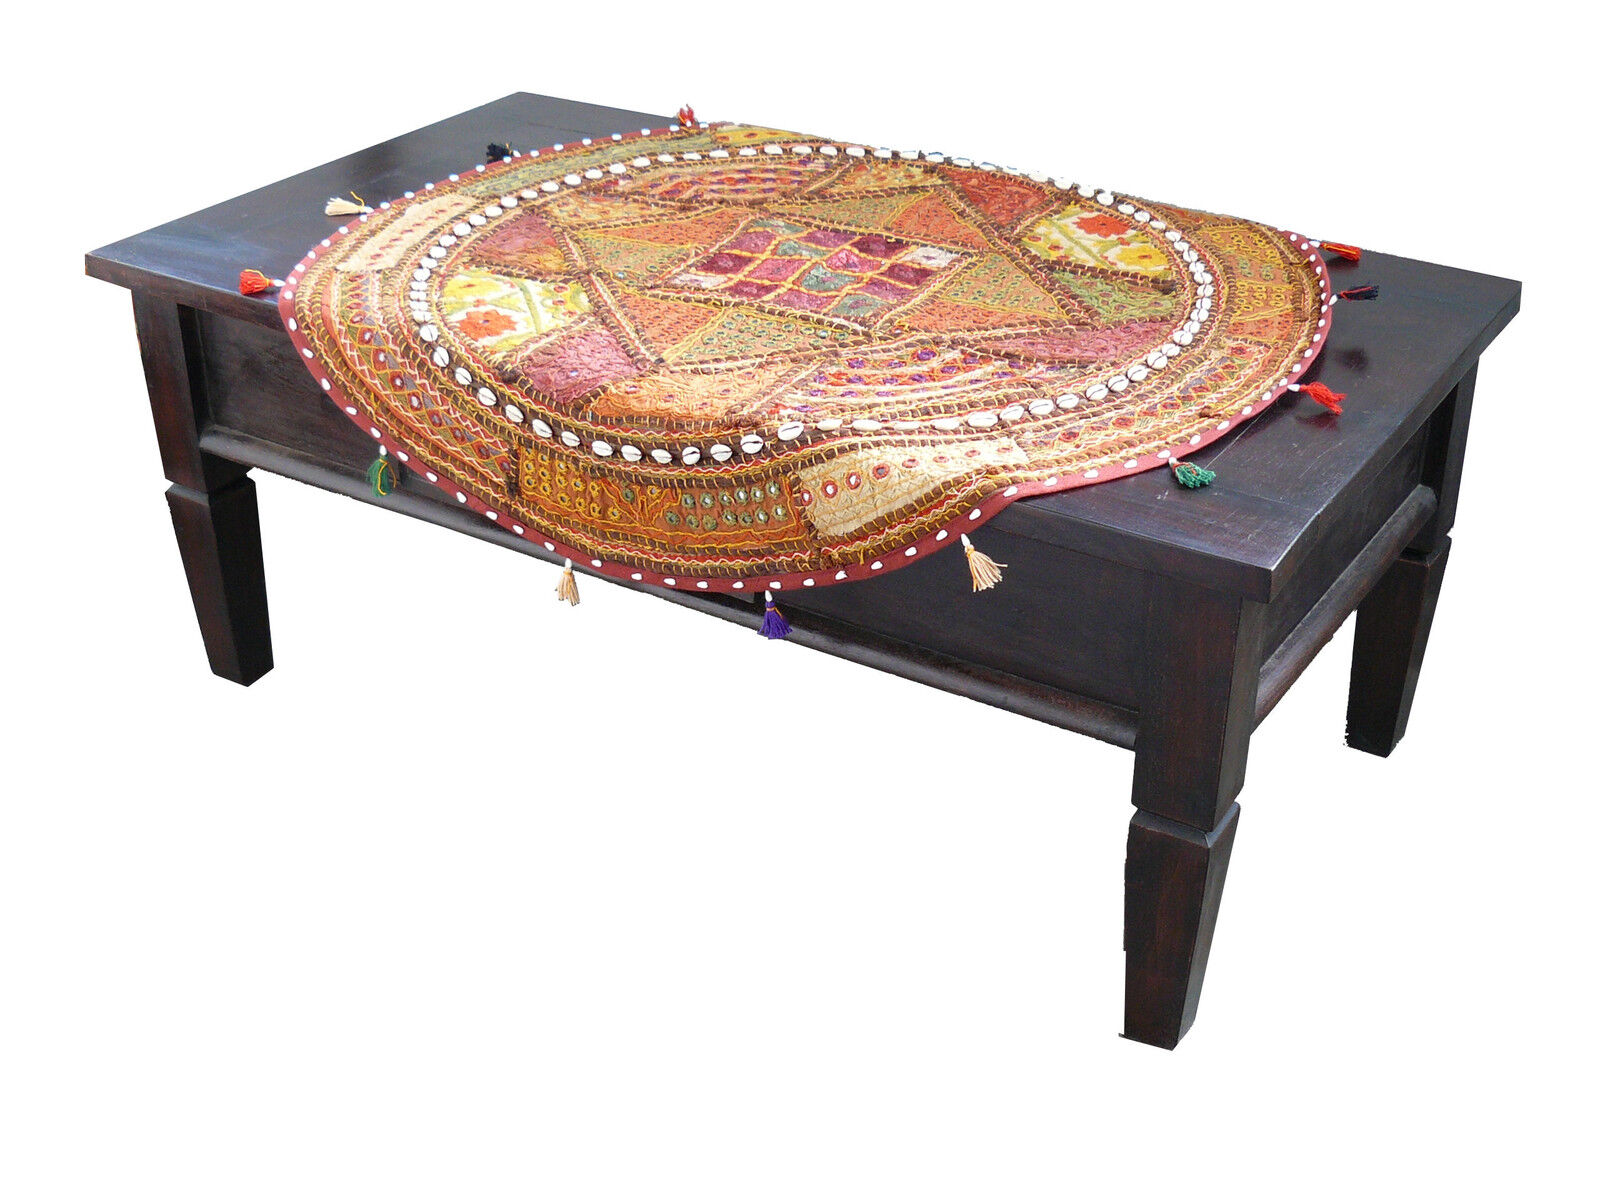 tischl ufer wandteppich wandbehang tisch decke patchwork indien orient goa yoga eur 27 99. Black Bedroom Furniture Sets. Home Design Ideas